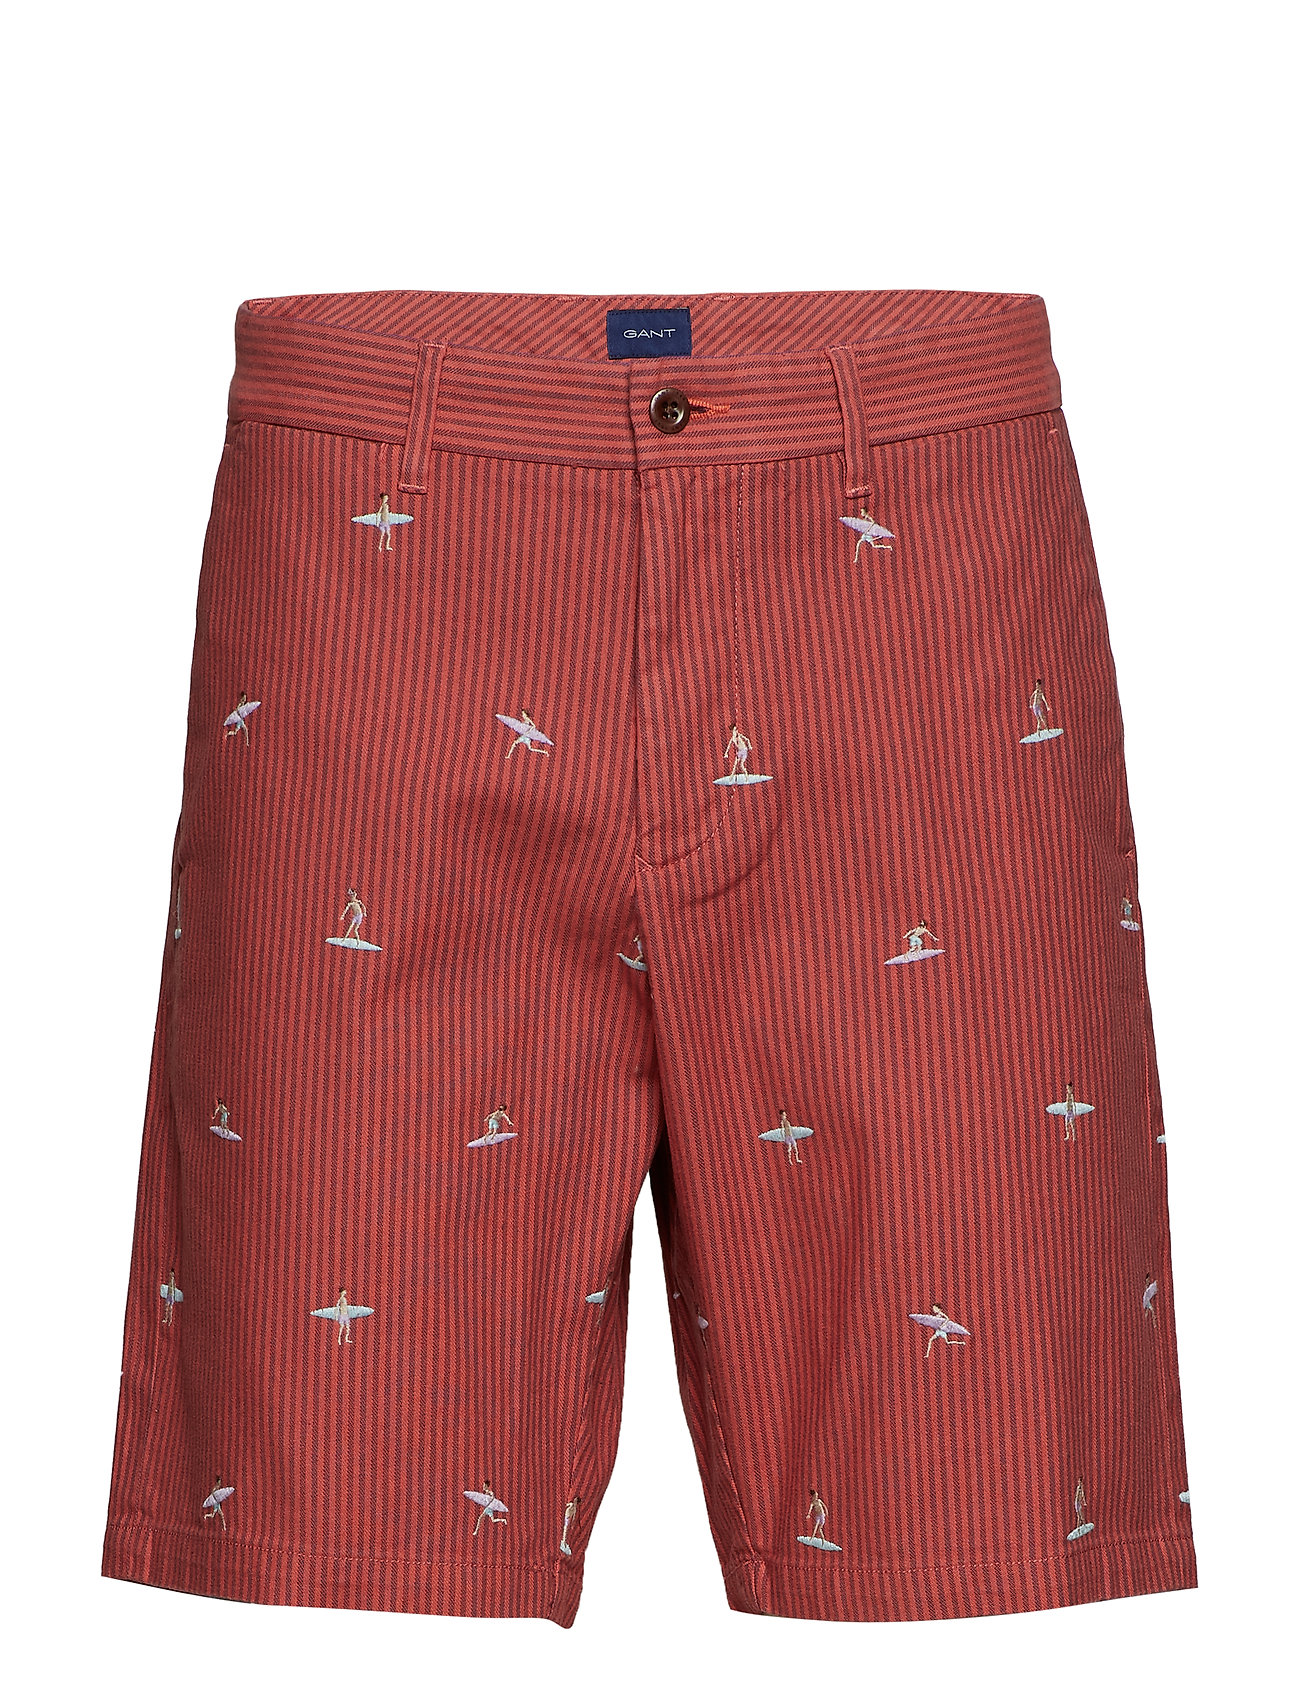 Gant O2. THE SURFER SHORT - MINERAL RED